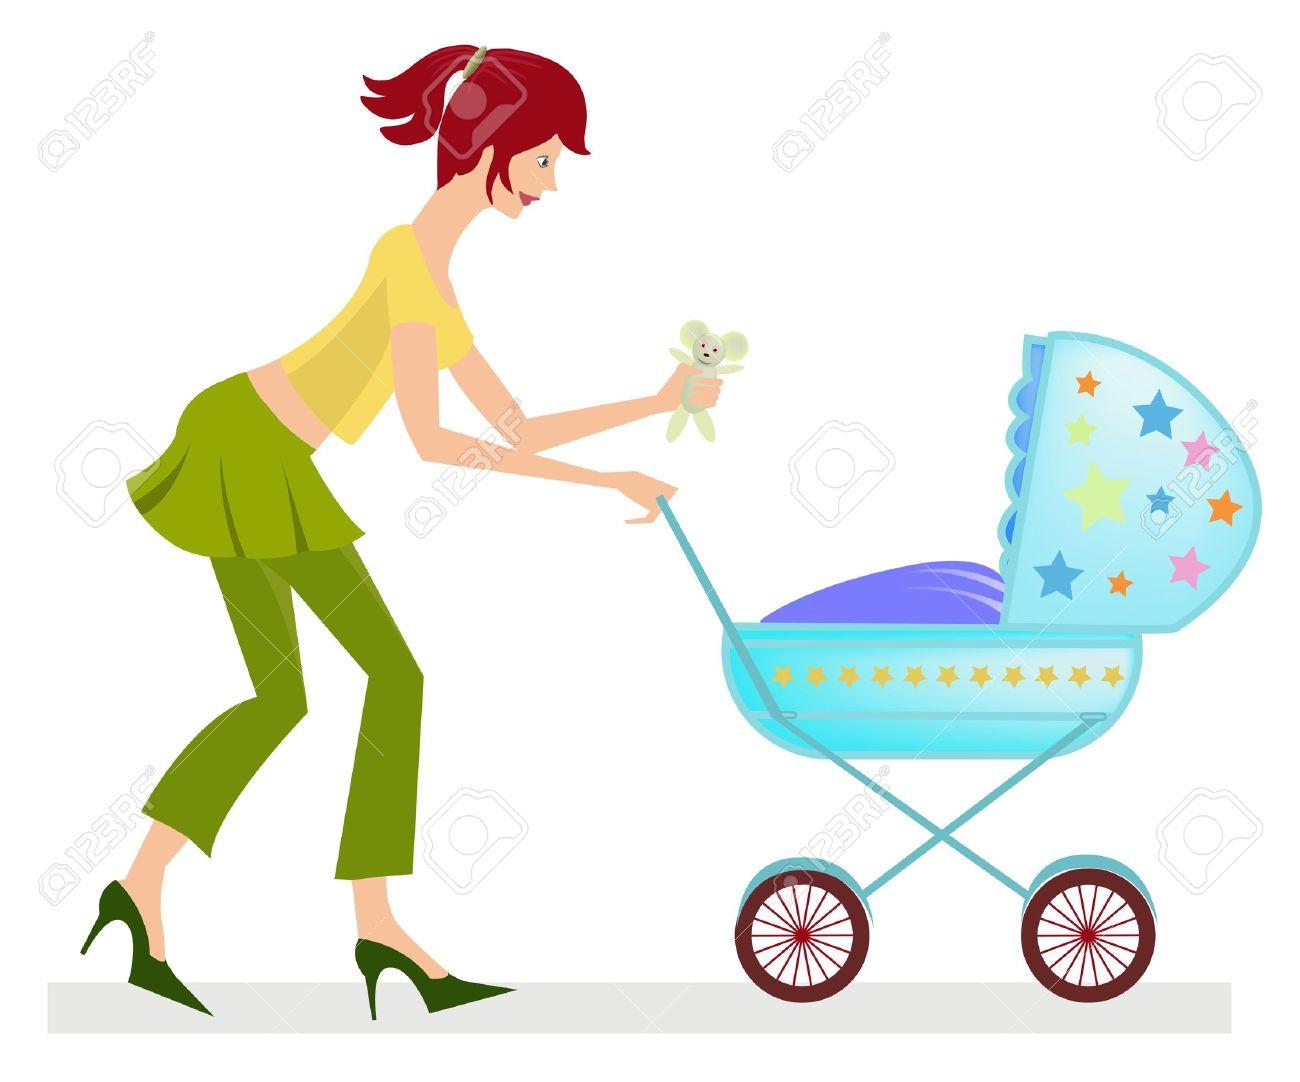 Mom pushing stroller clipart.